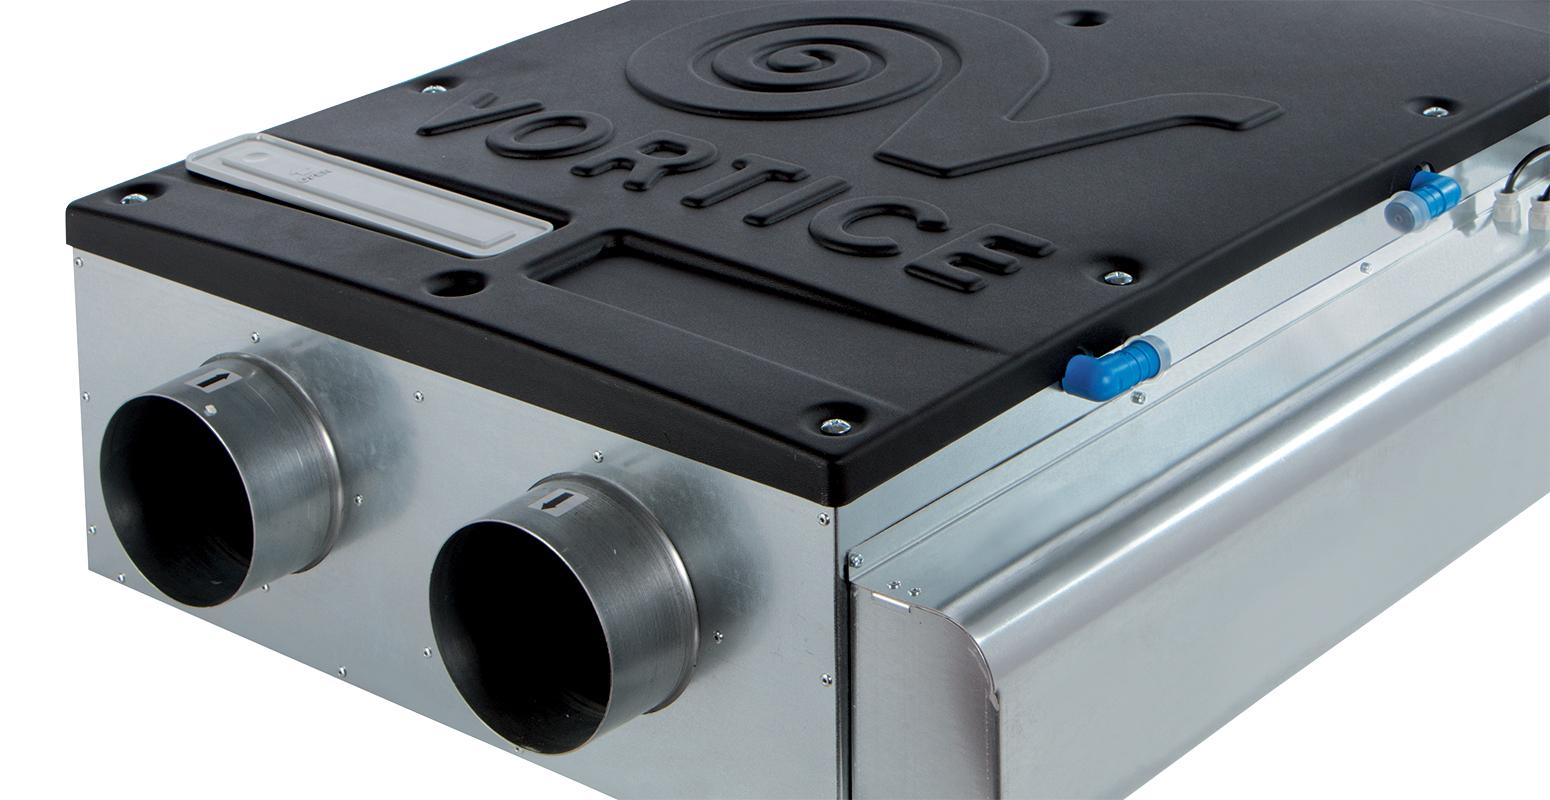 Vort hri 200 phantom ventilazione residenziale recupero - Ventilazione recupero calore ...